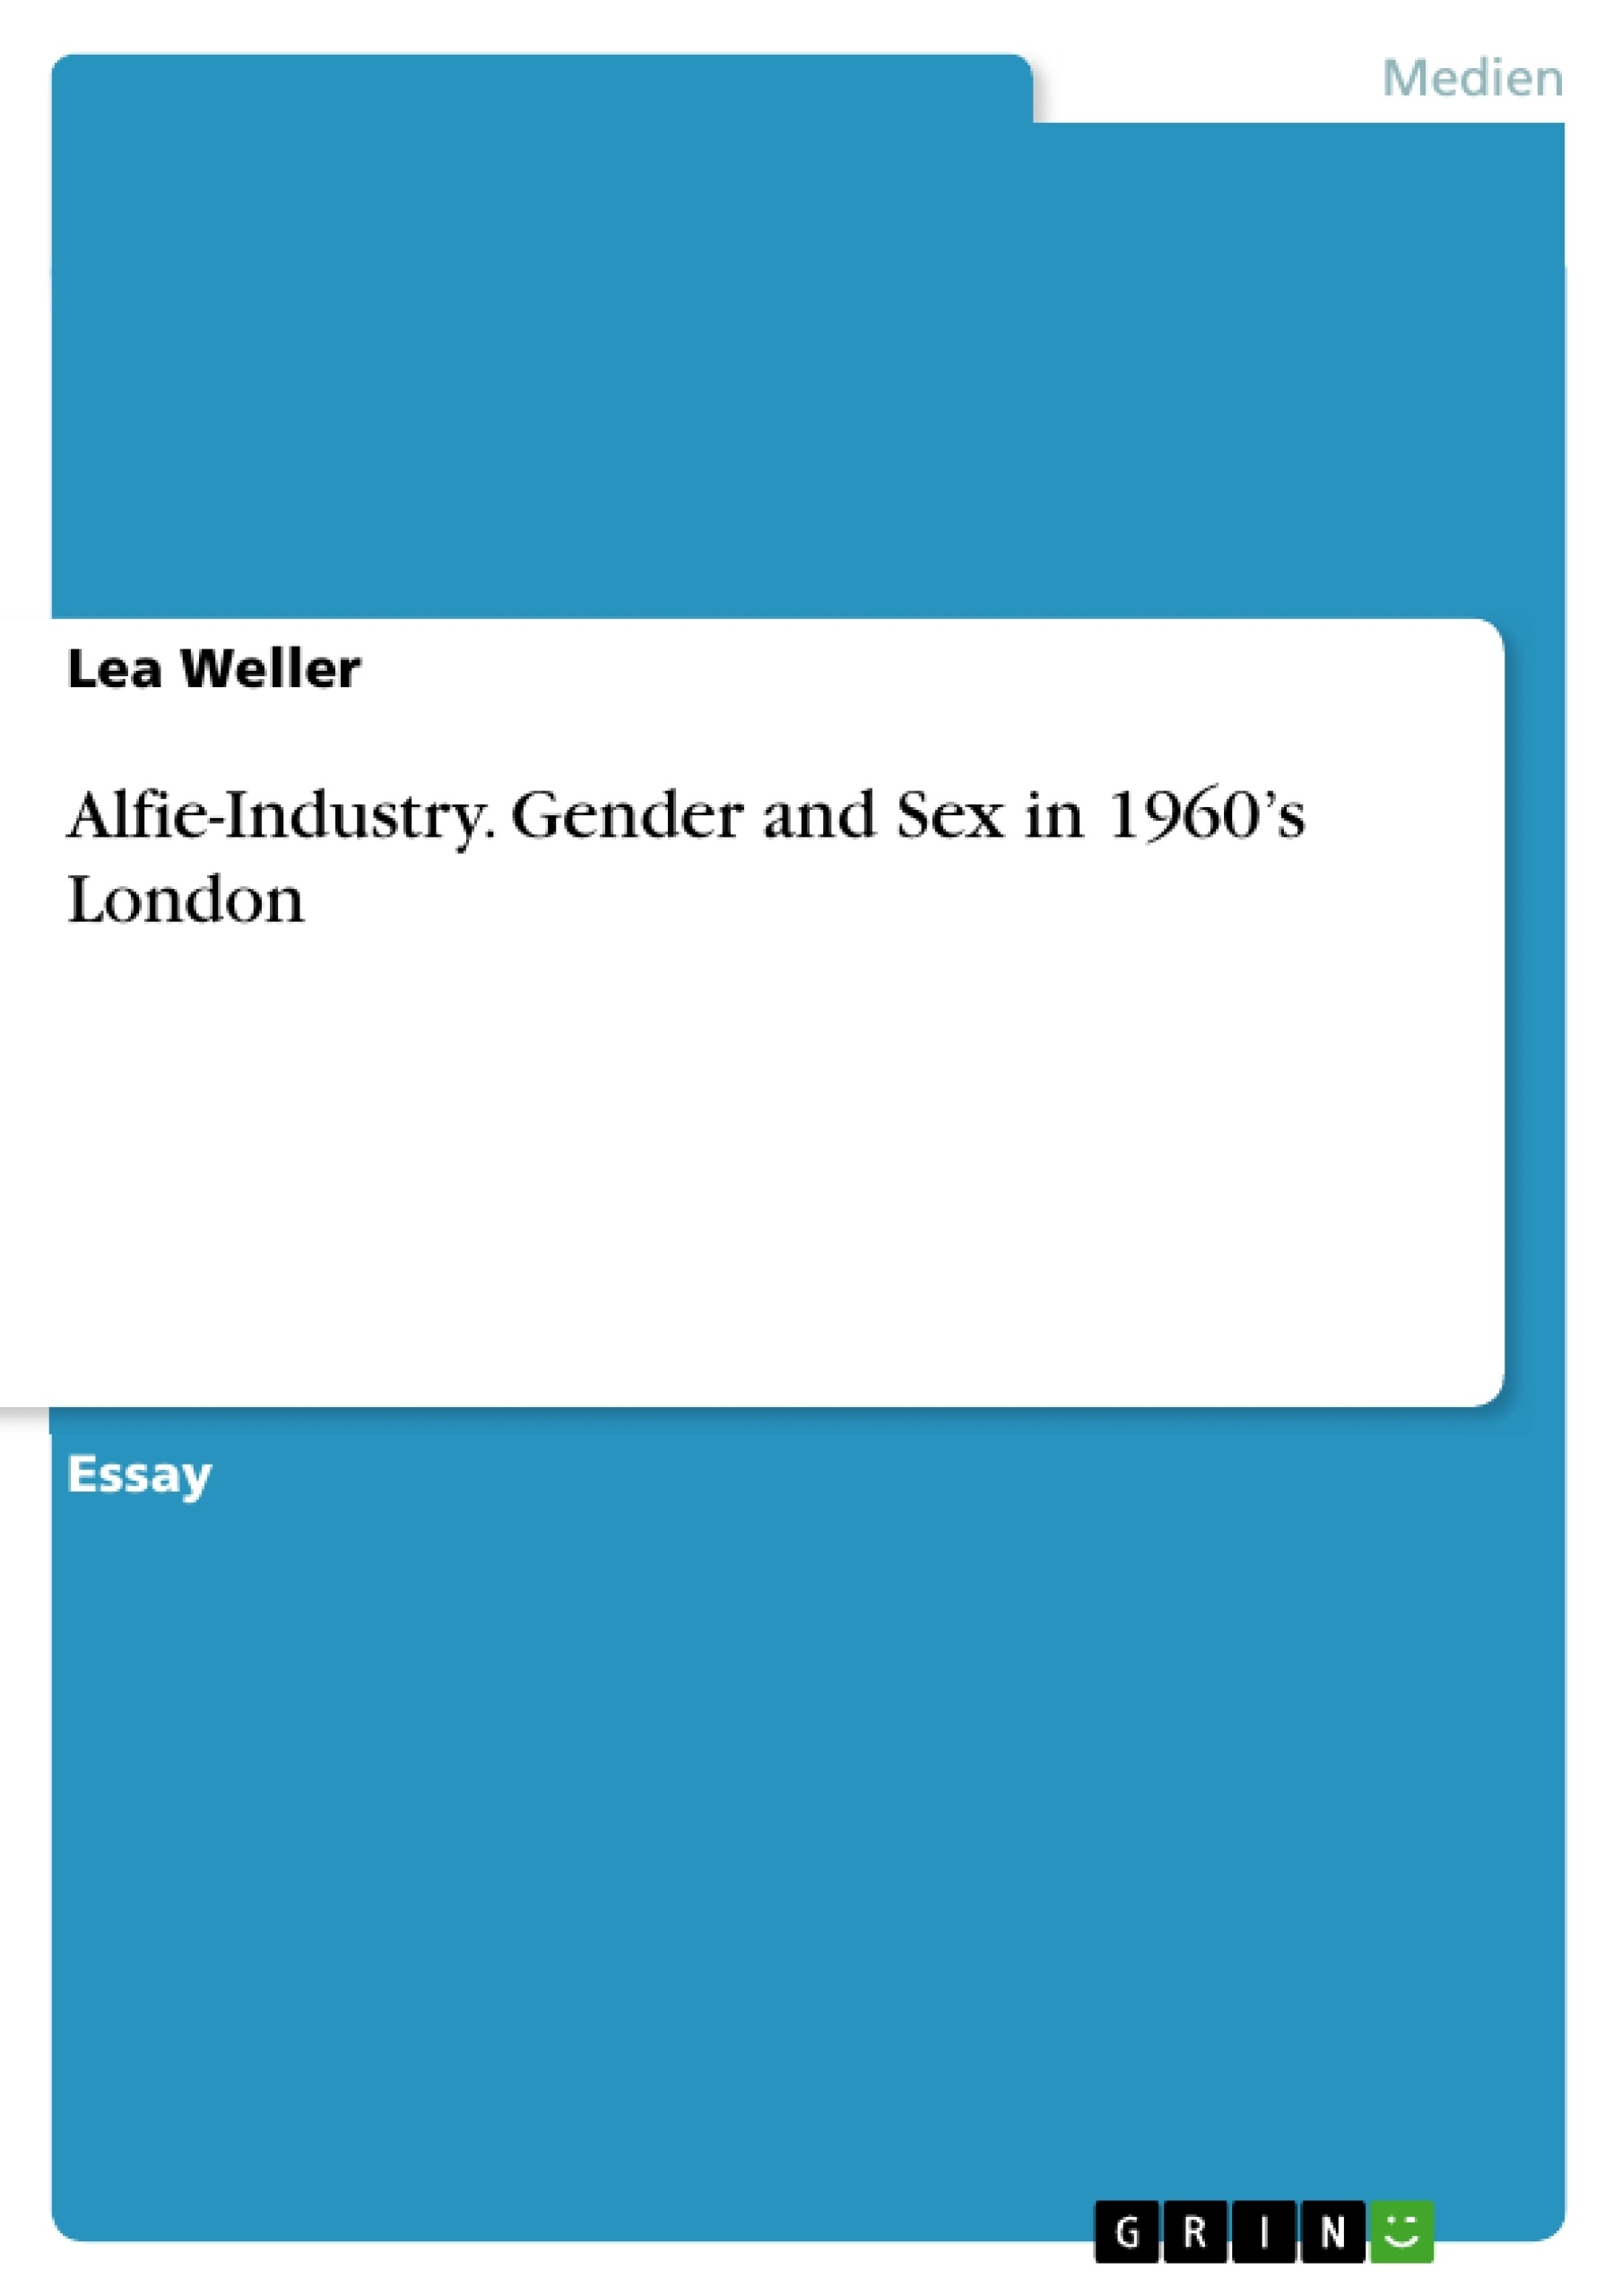 Titel: Alfie-Industry. Gender and Sex in 1960's London